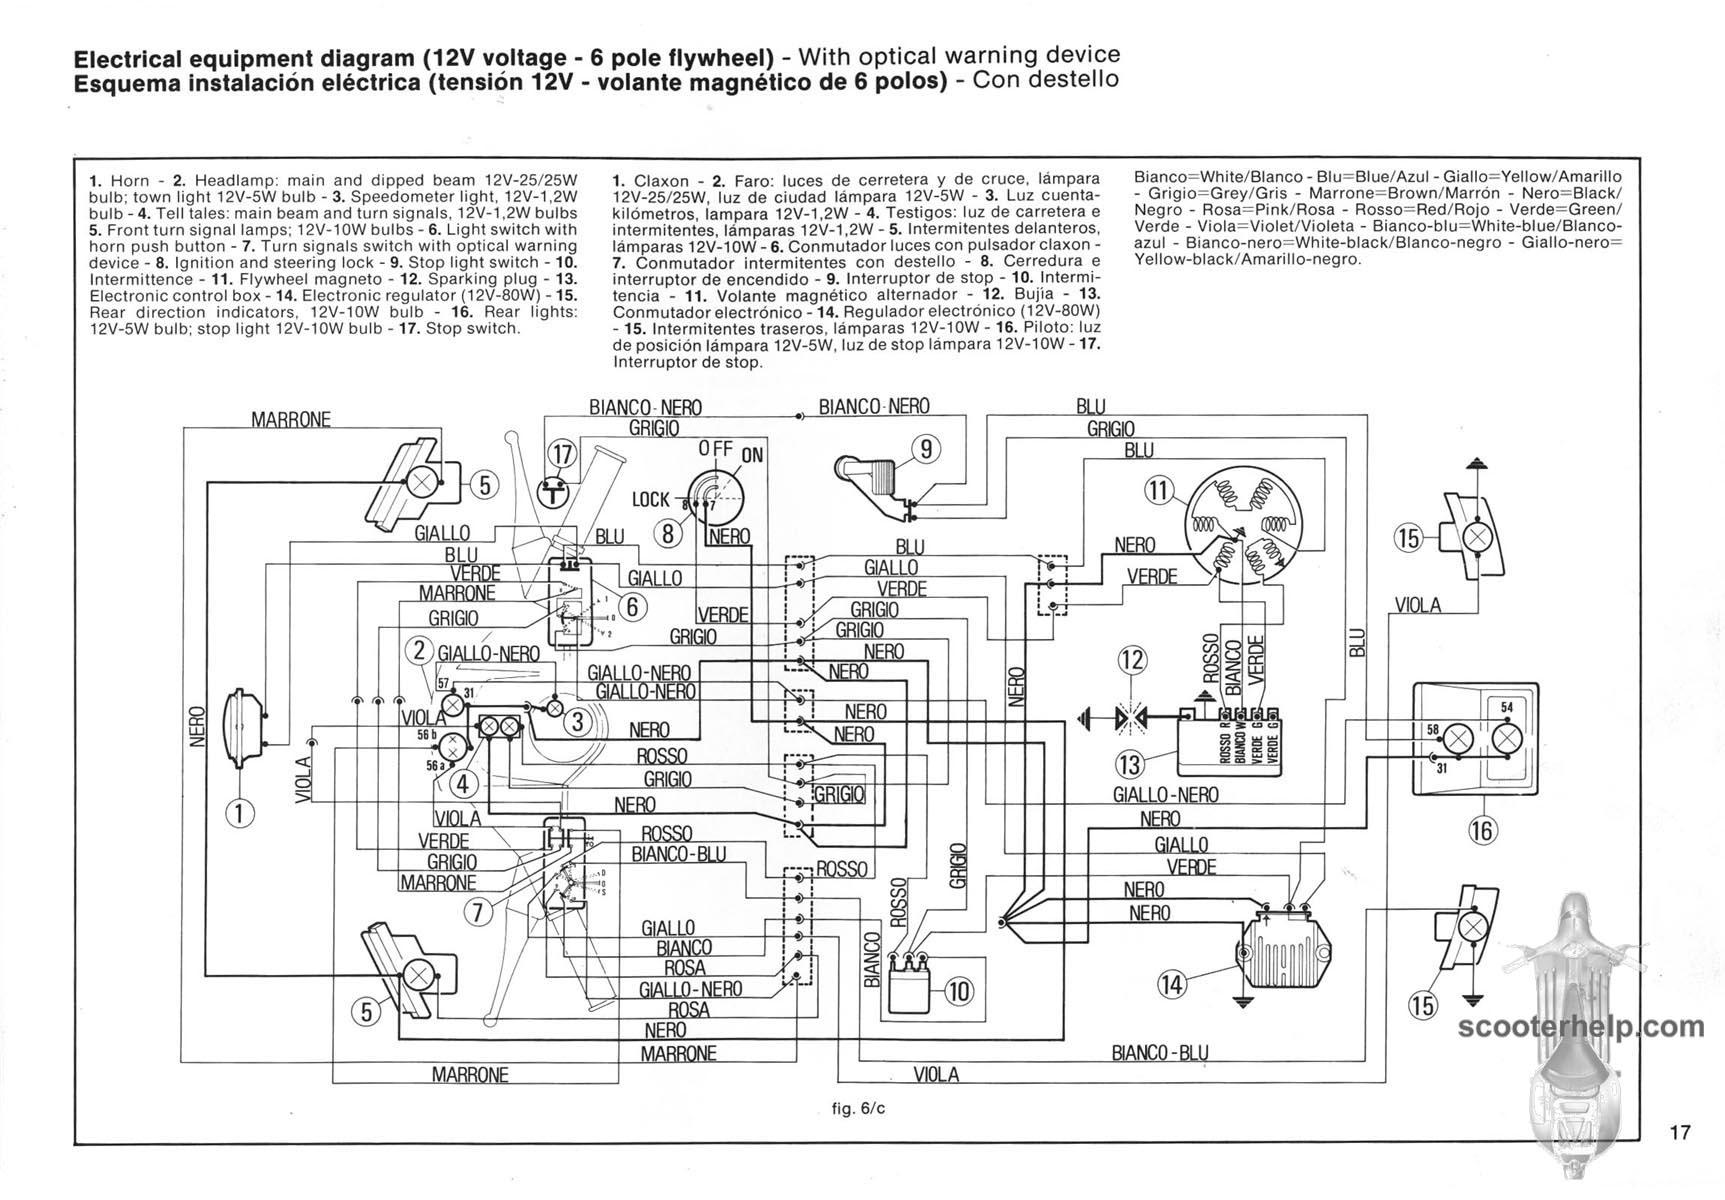 17 2001 vespa wiring diagram ask & answer wiring diagram \u2022